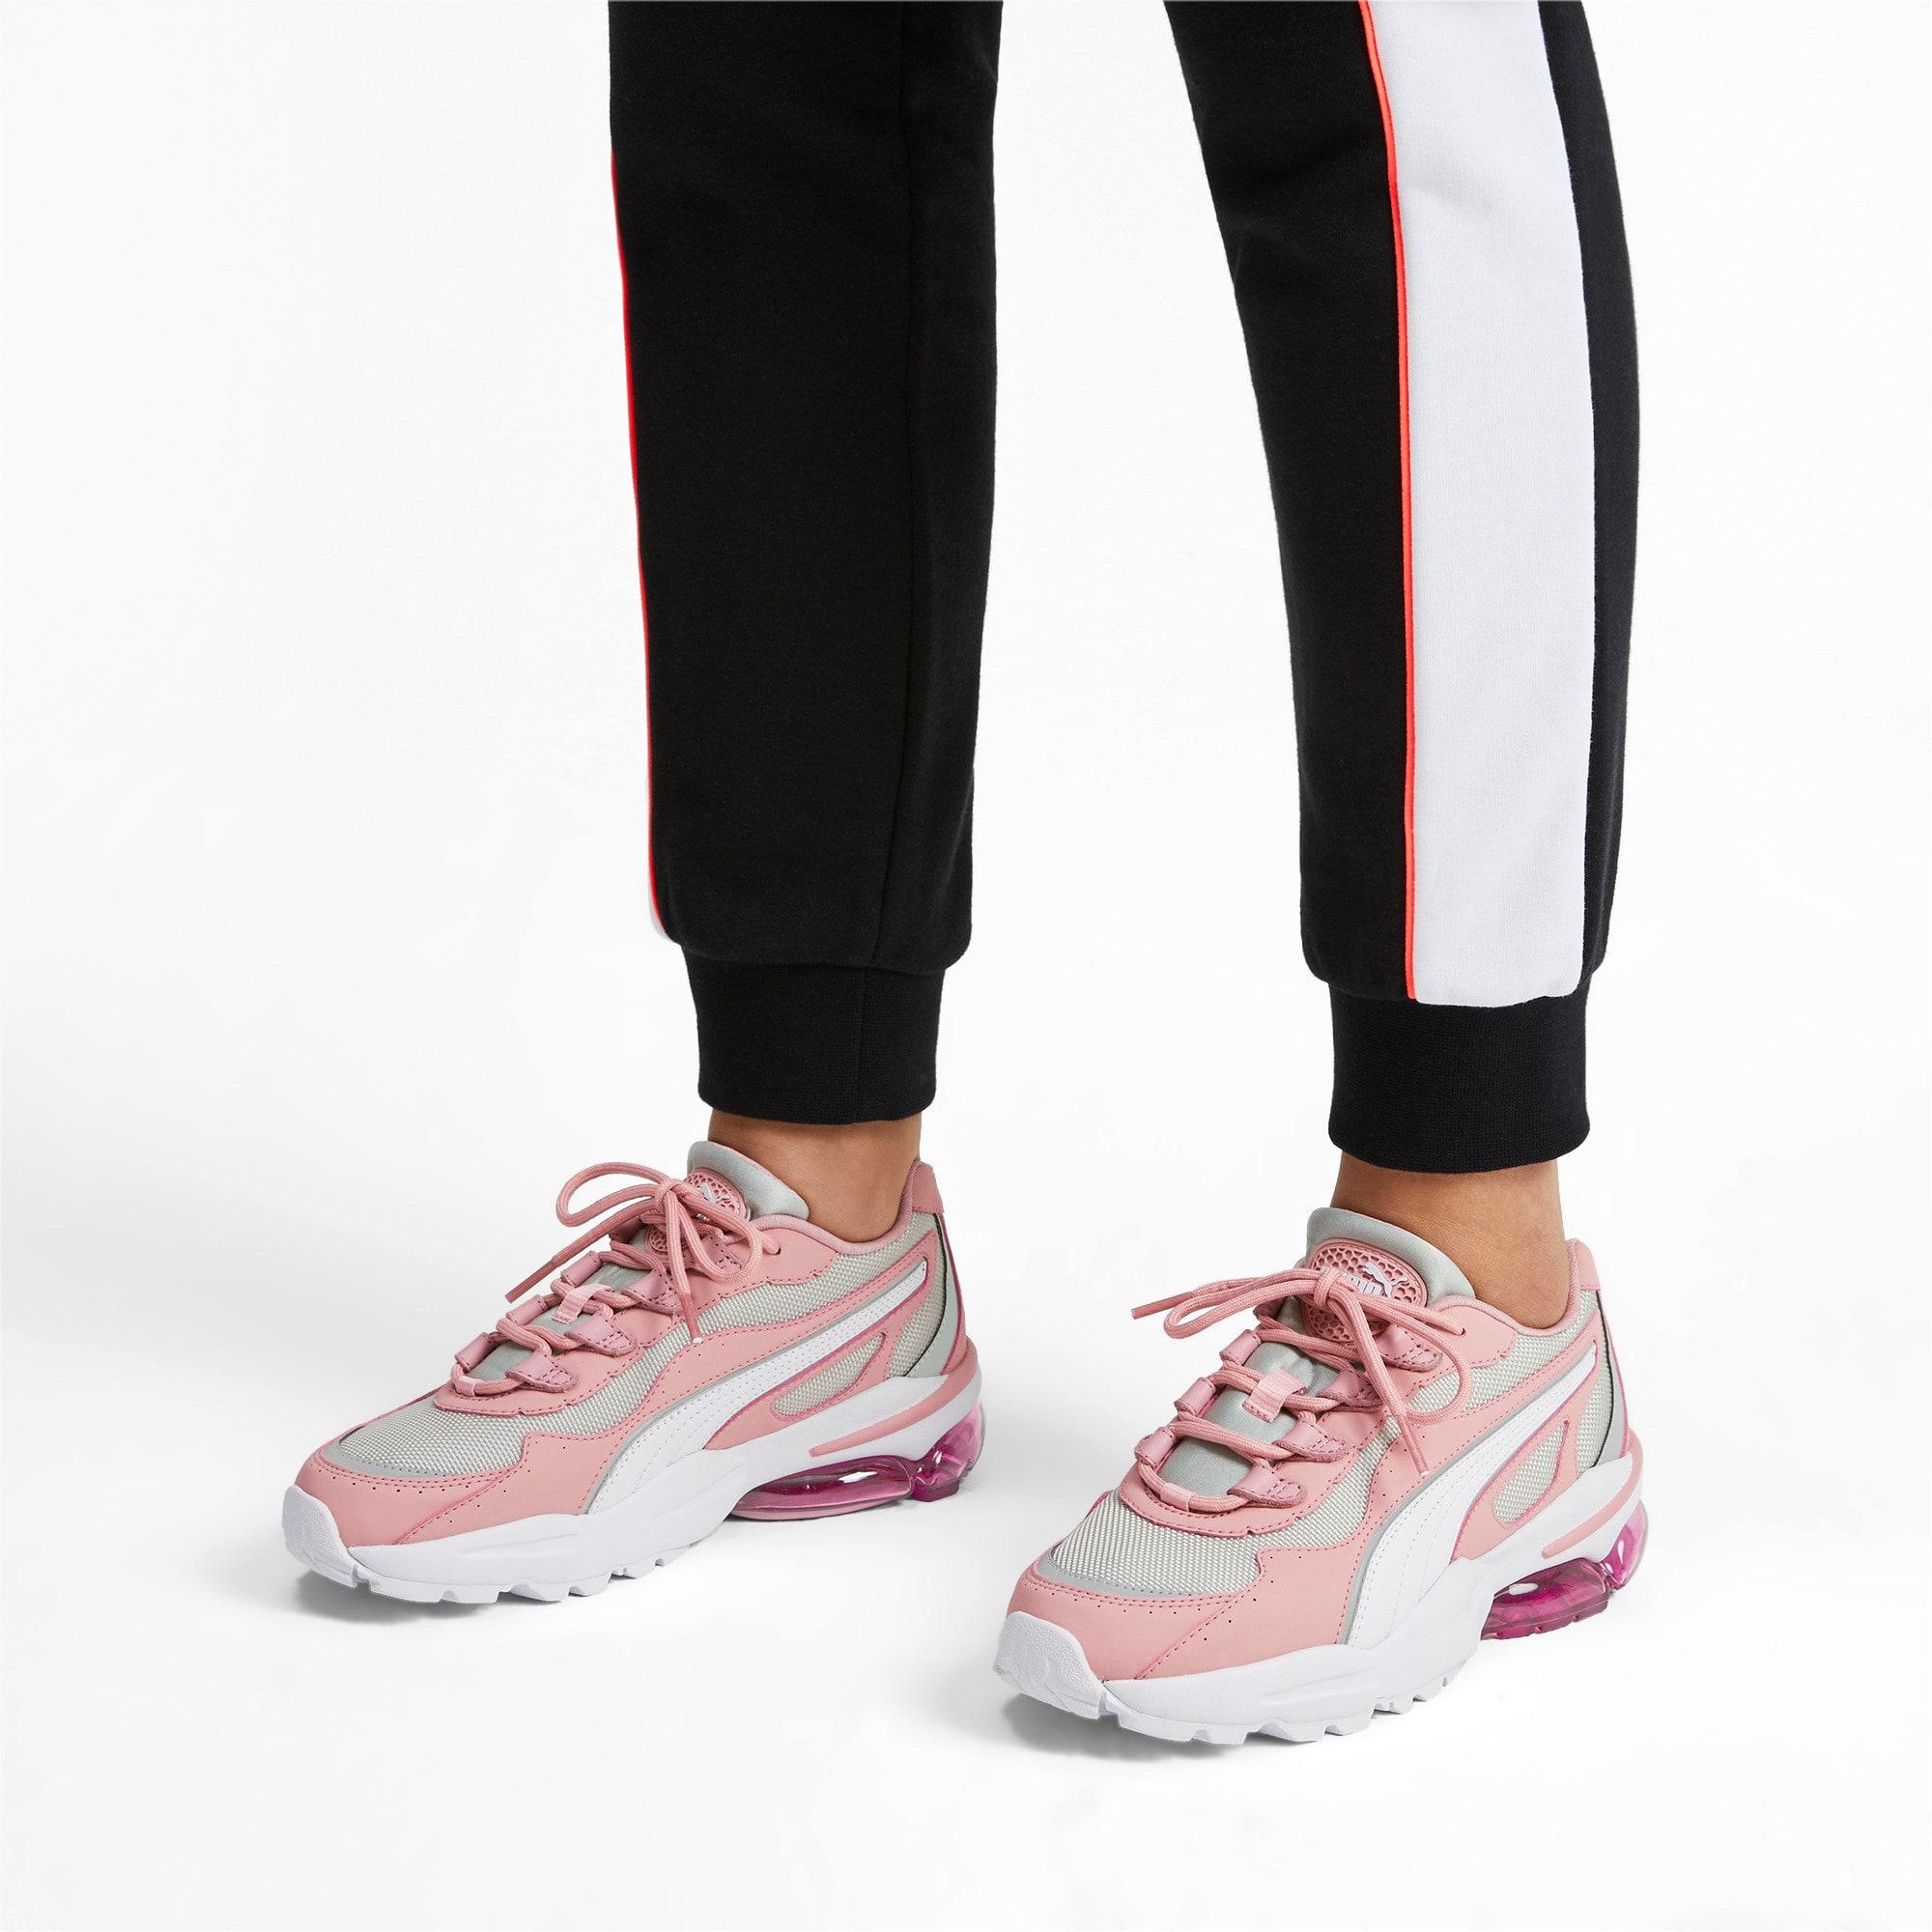 Miniatura 2 de Zapatos deportivos CELL Stellar para mujer, Bridal Rose-Gray Violet, mediano